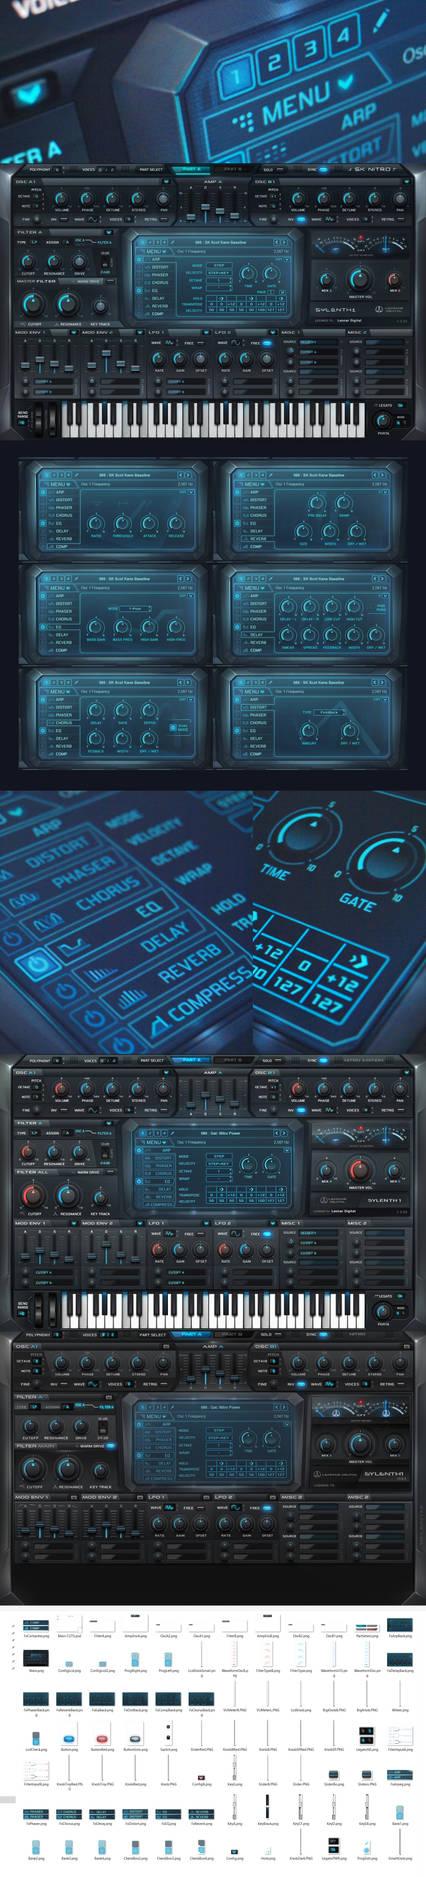 Sylenth1 Nitro Skin Audio VST GUI Design by Scott-Kane